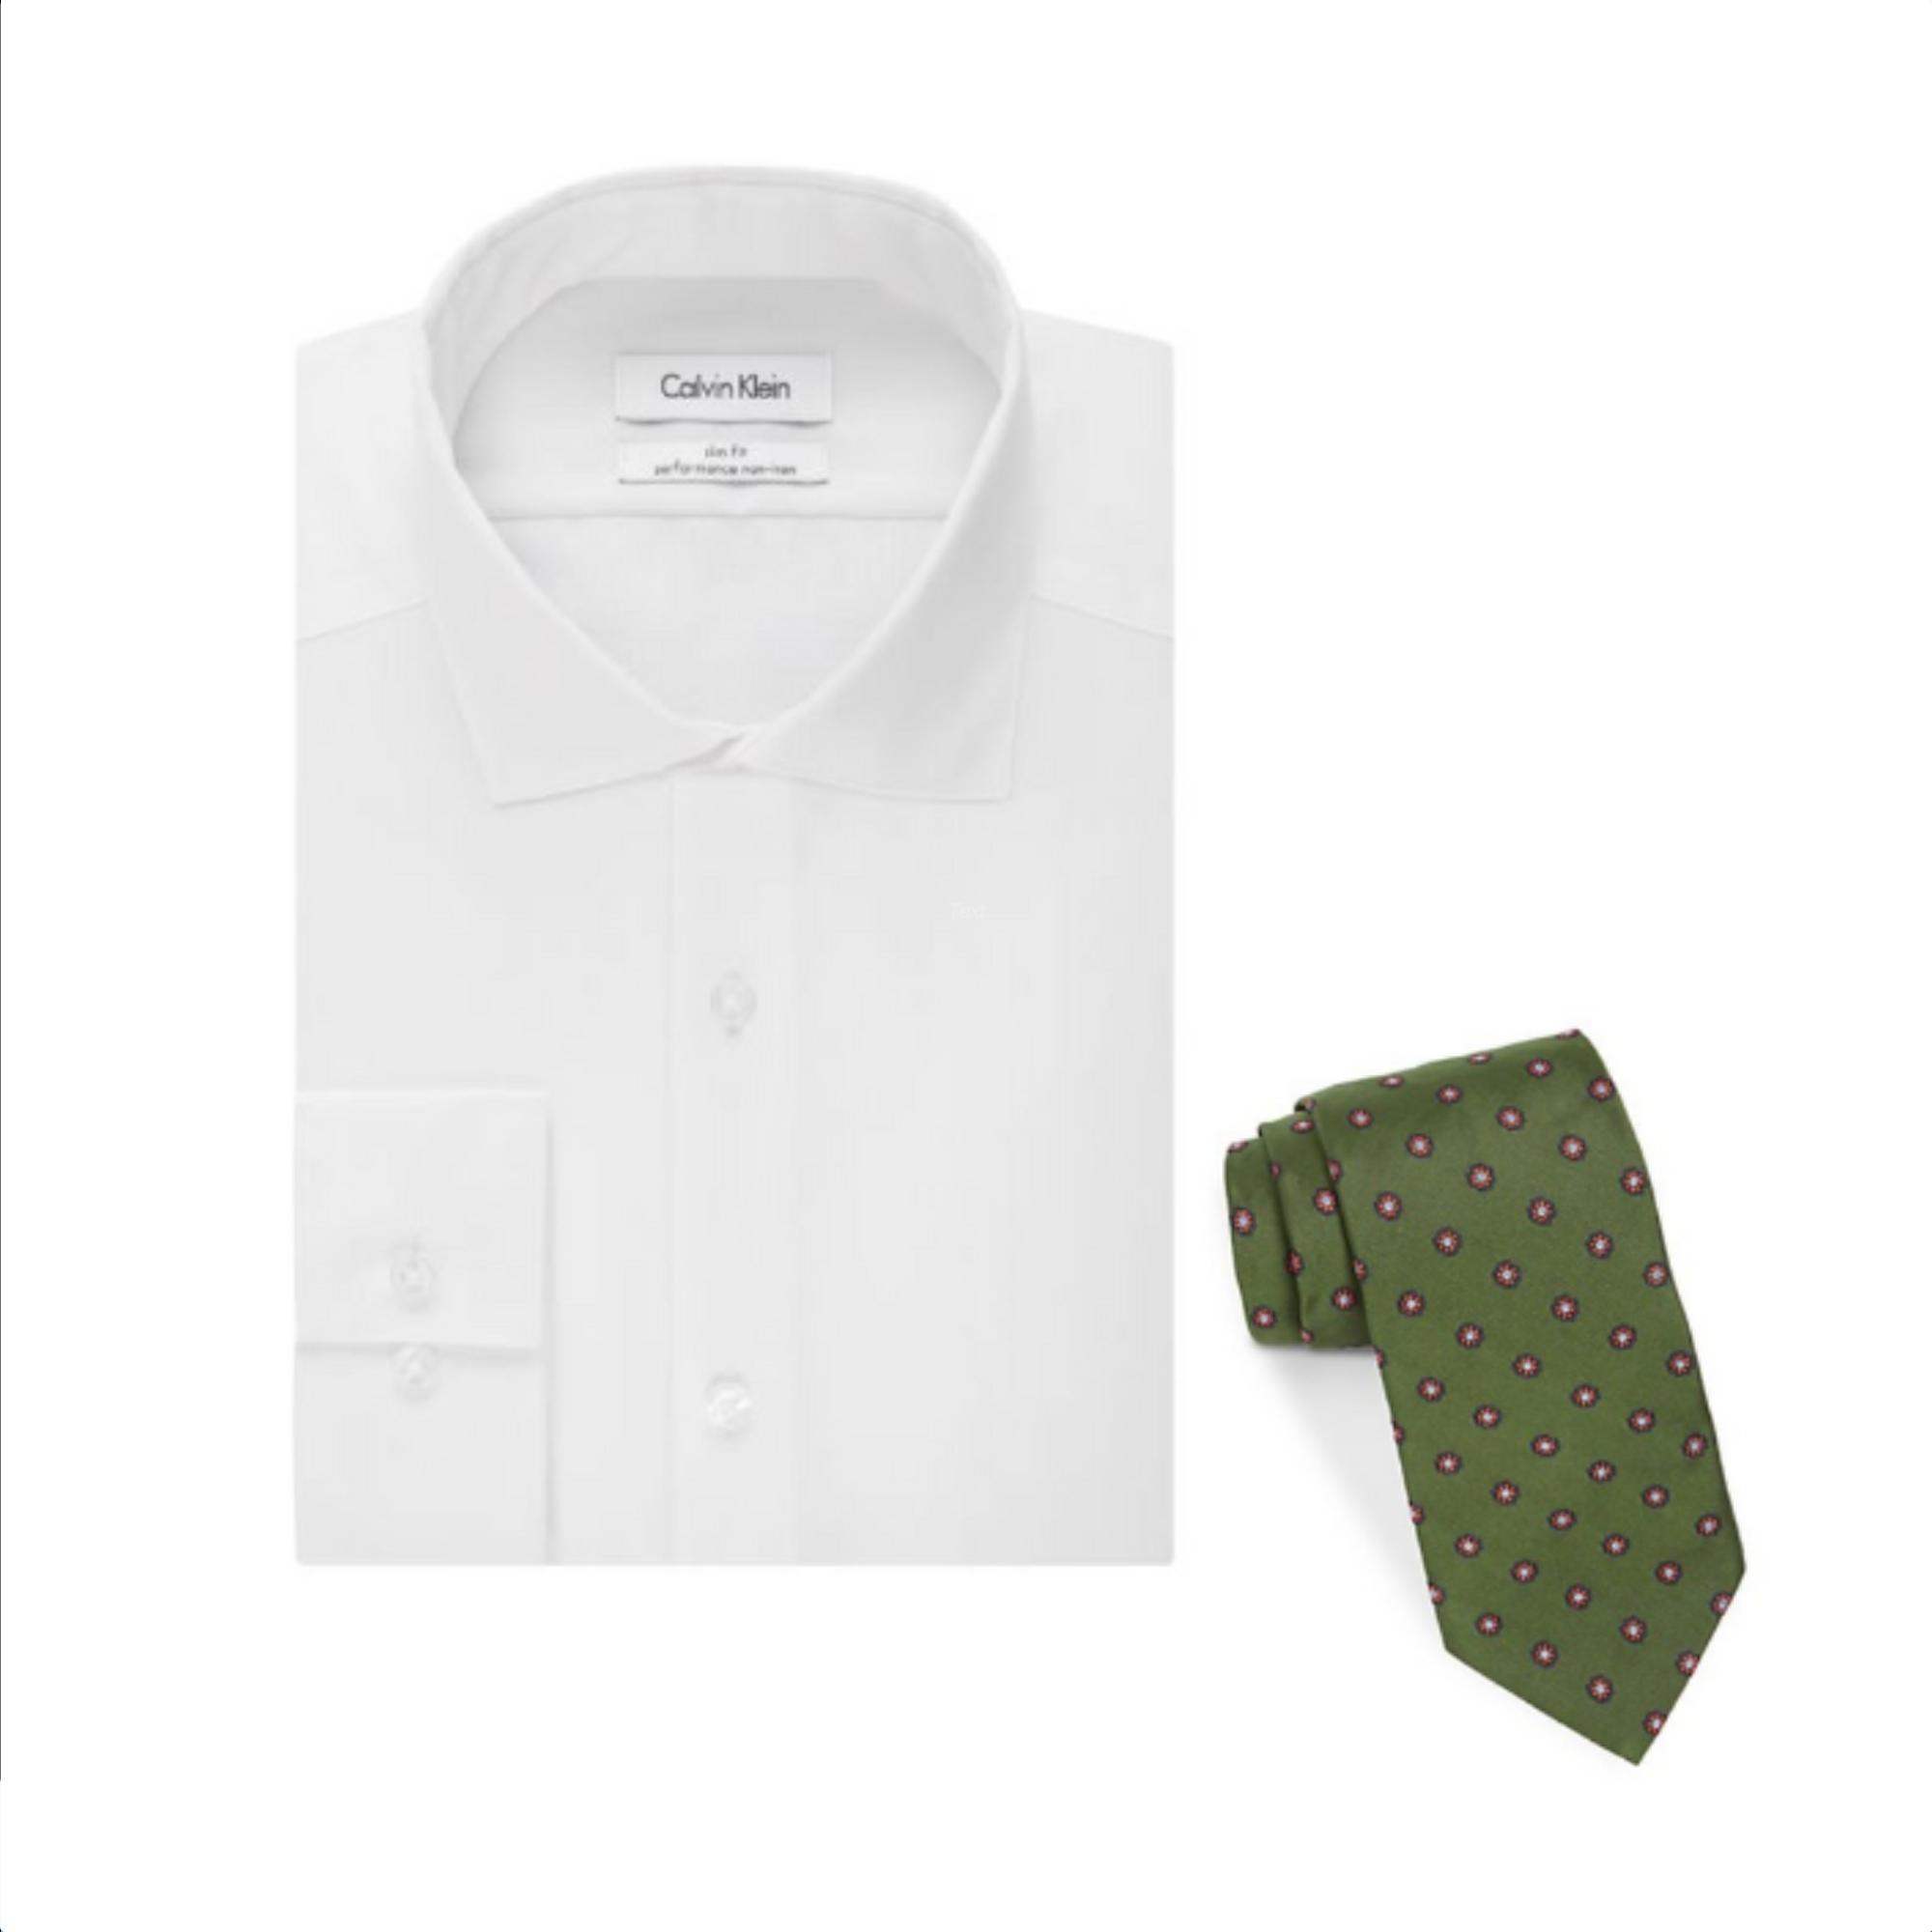 Calvin Klein Shirt + Brooks Brothers Tie